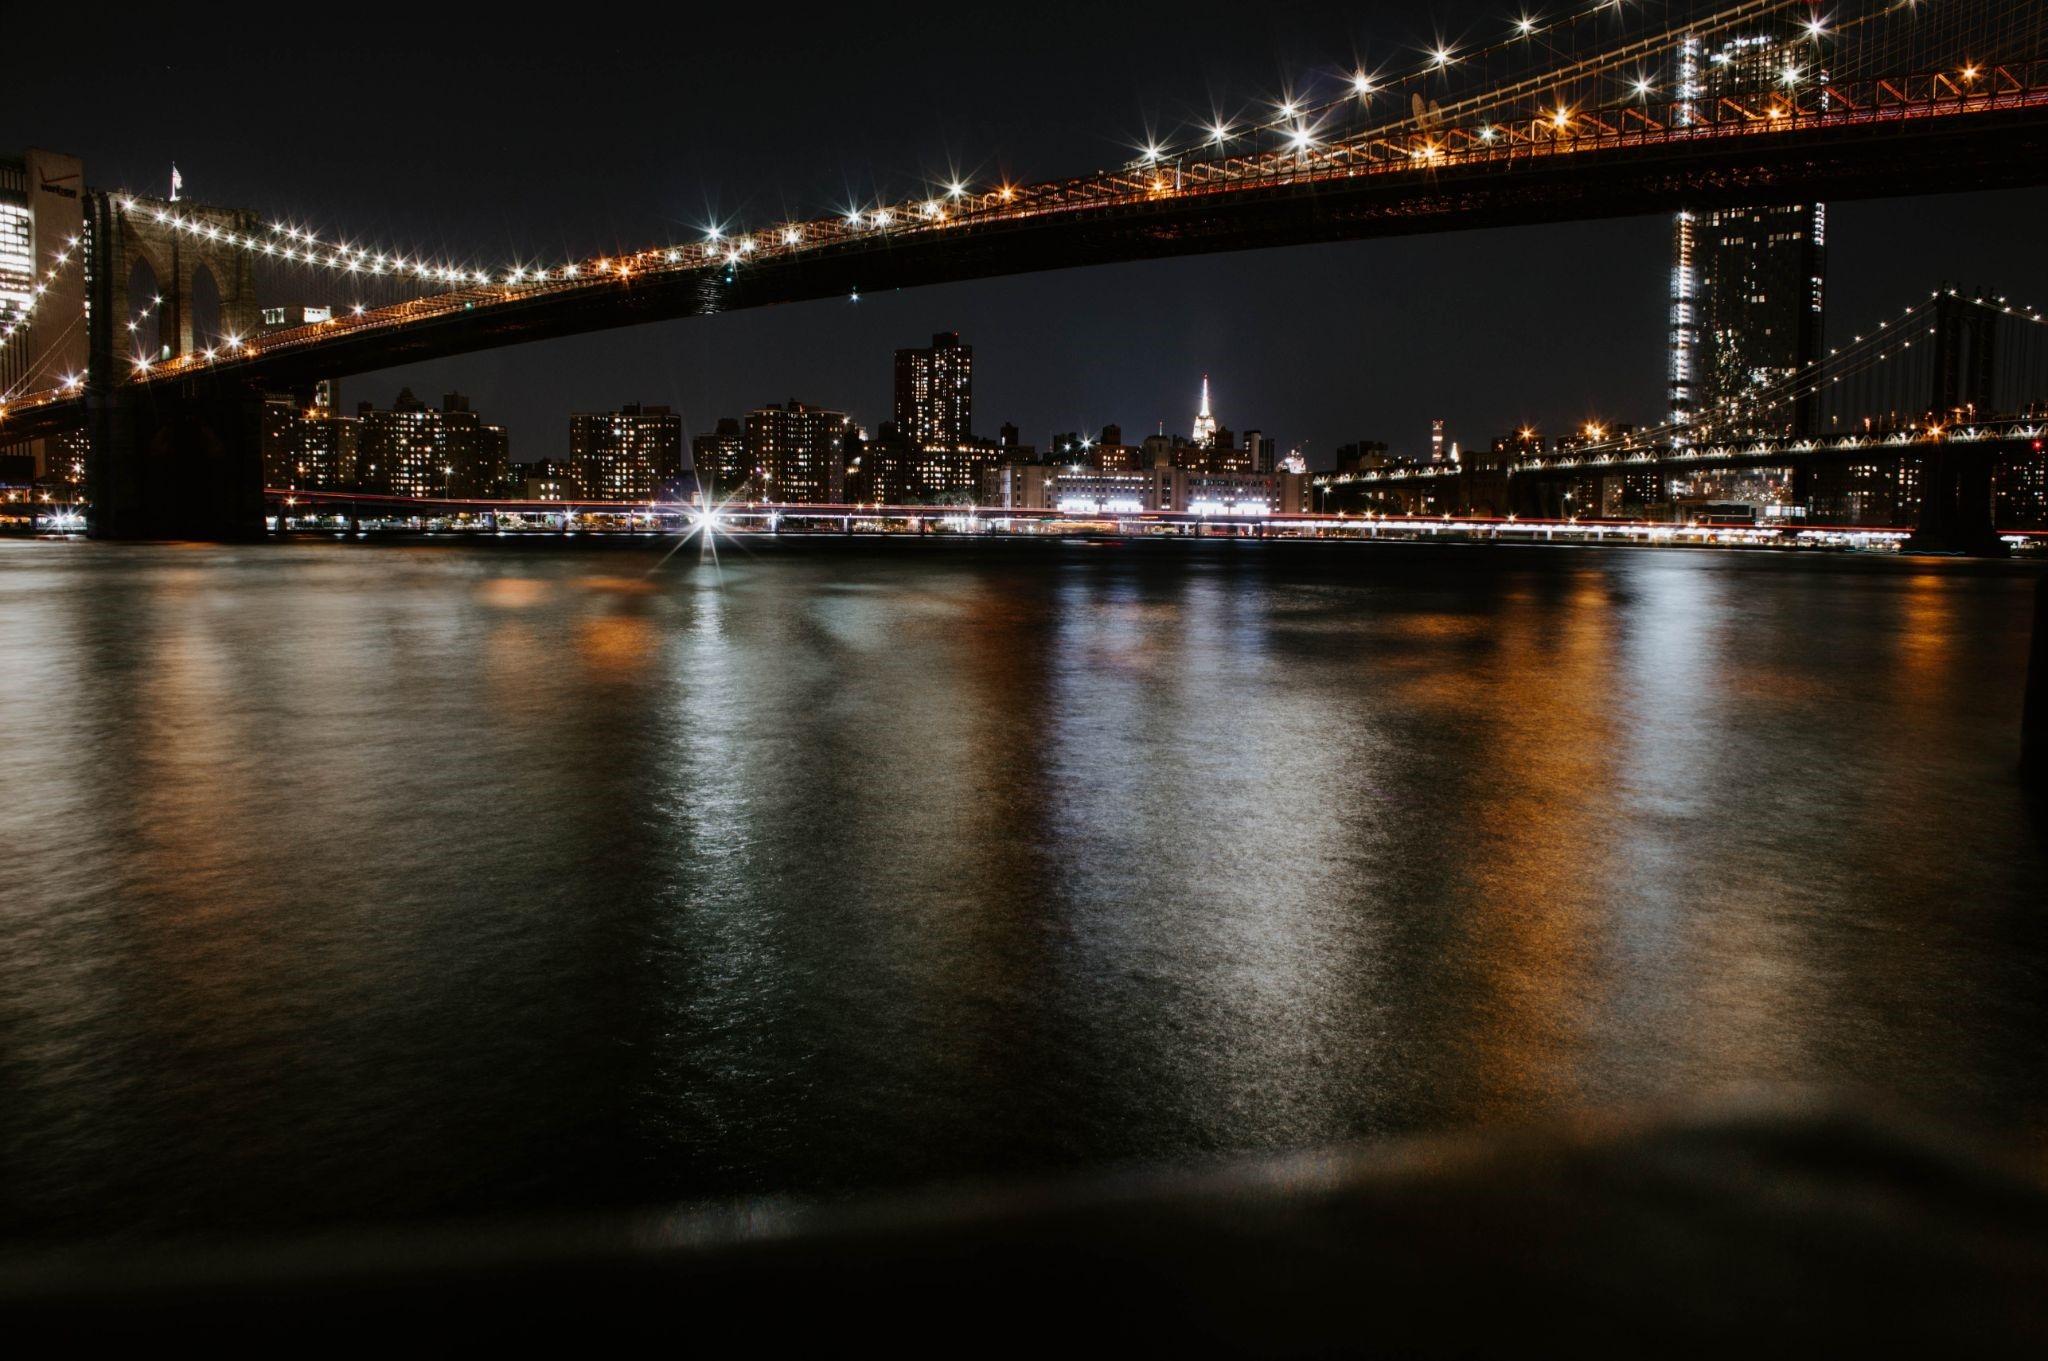 Bridge in NYC at night